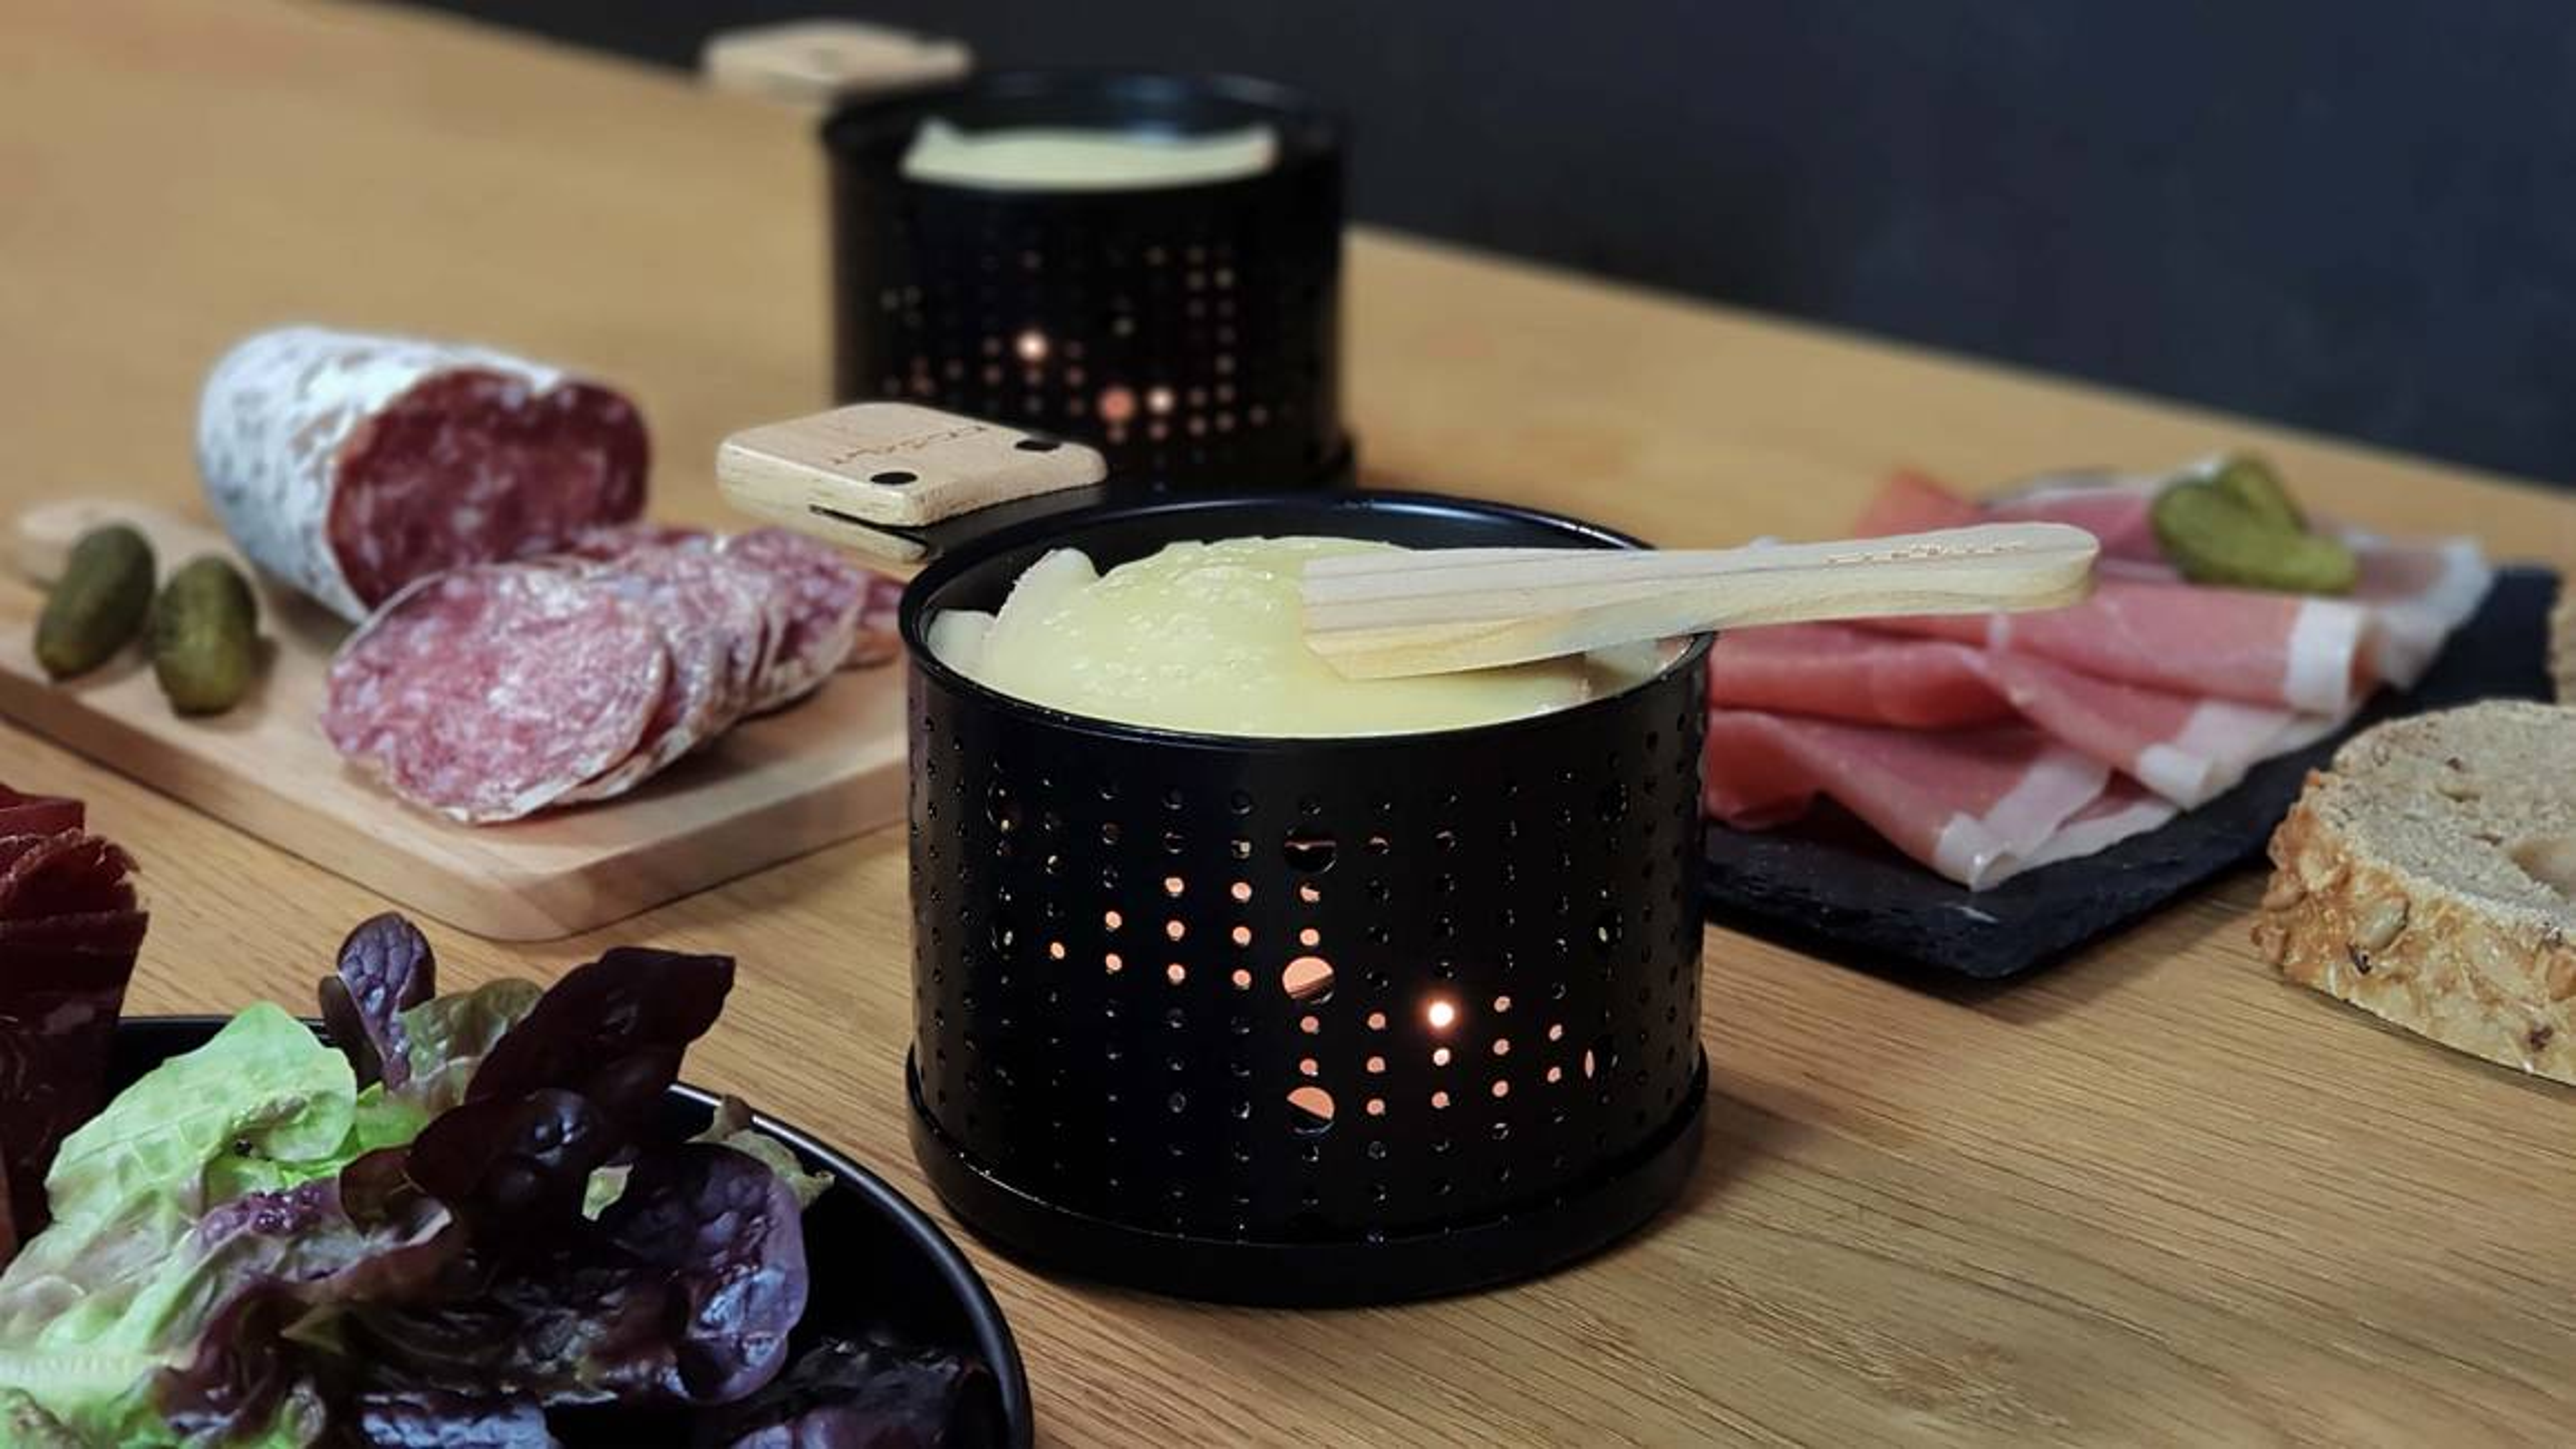 appareils à raclette-gallery